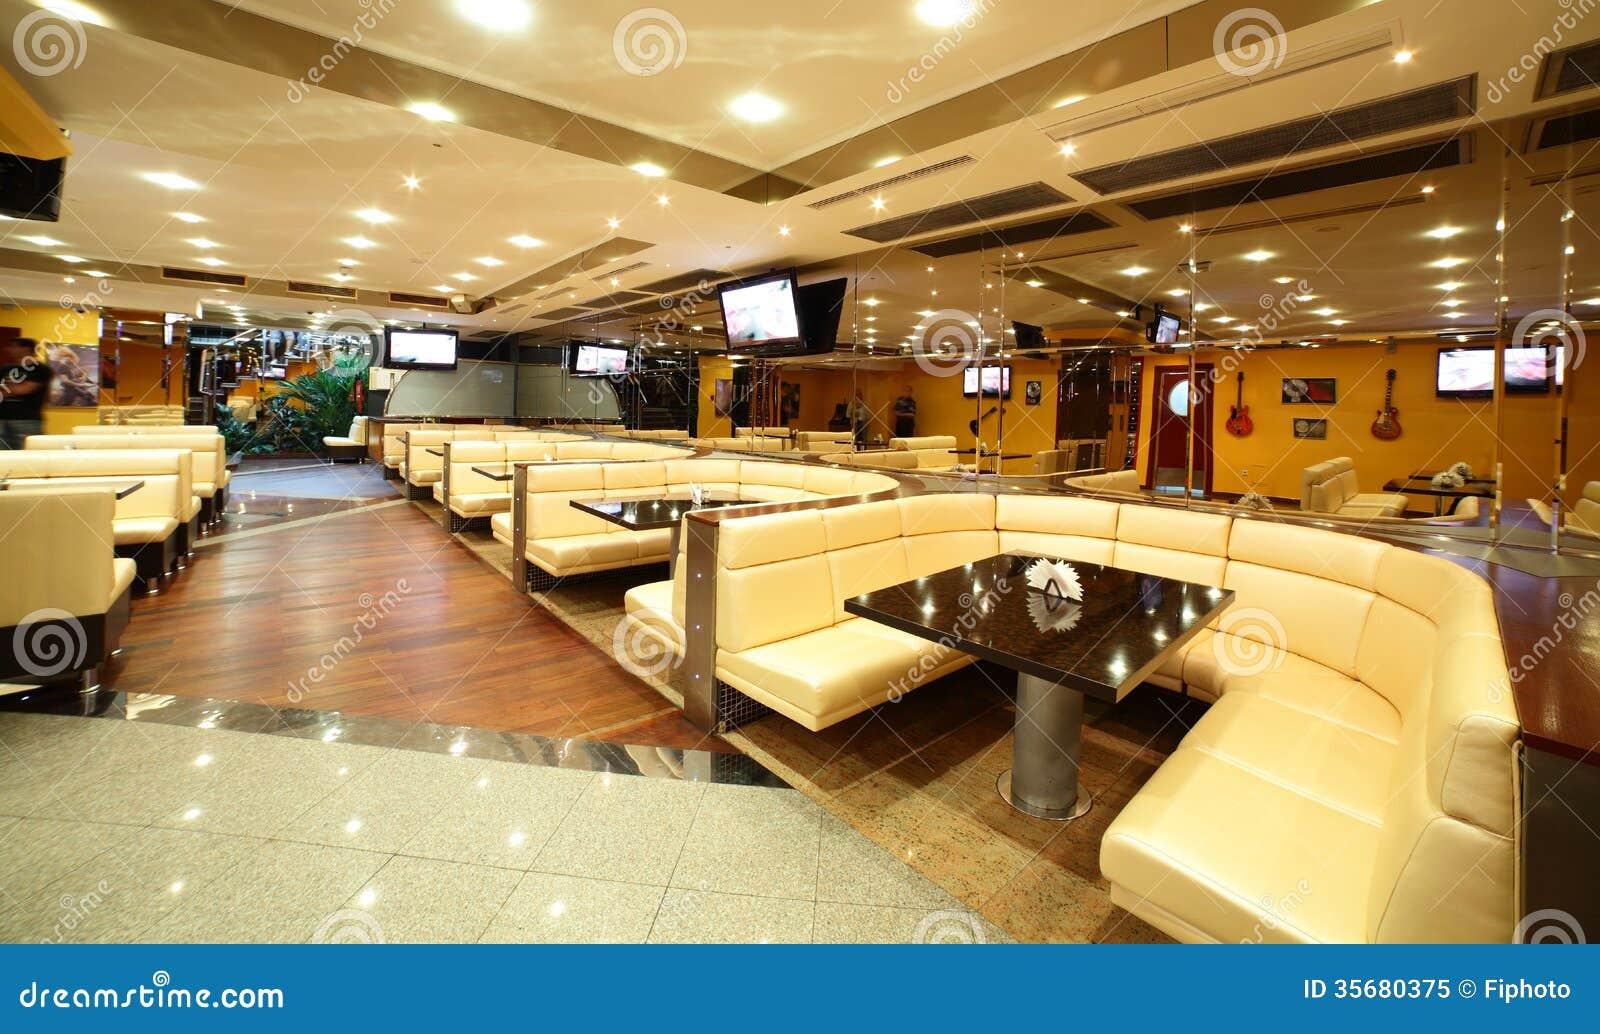 Beautiful Interior Of Modern Restaurant Stock Image - Image of ...